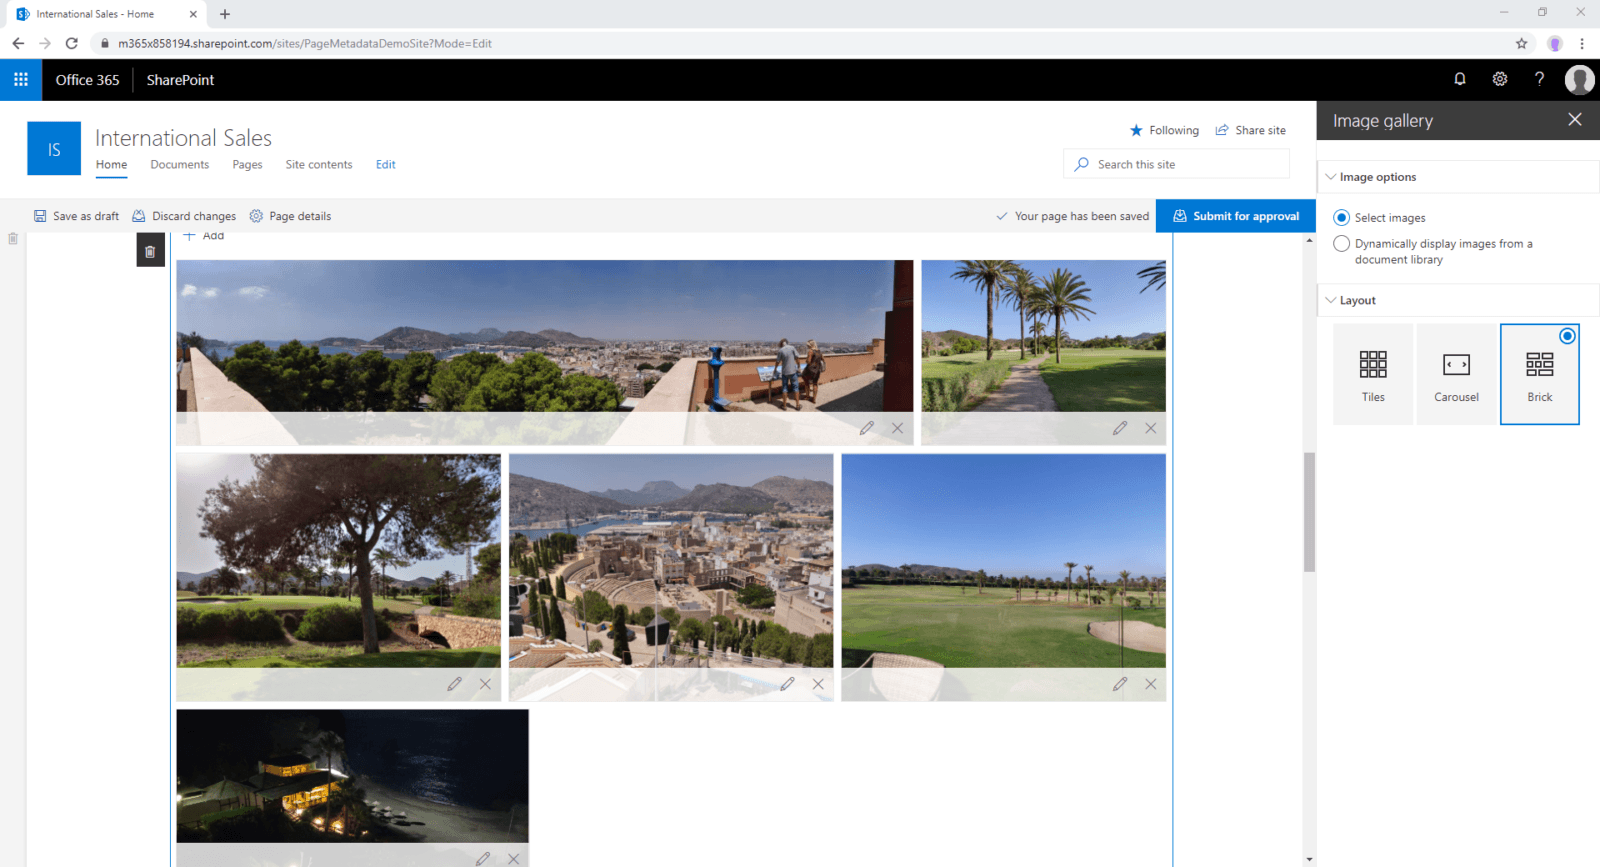 Screenshot showing Brick layout of Image gallery web part